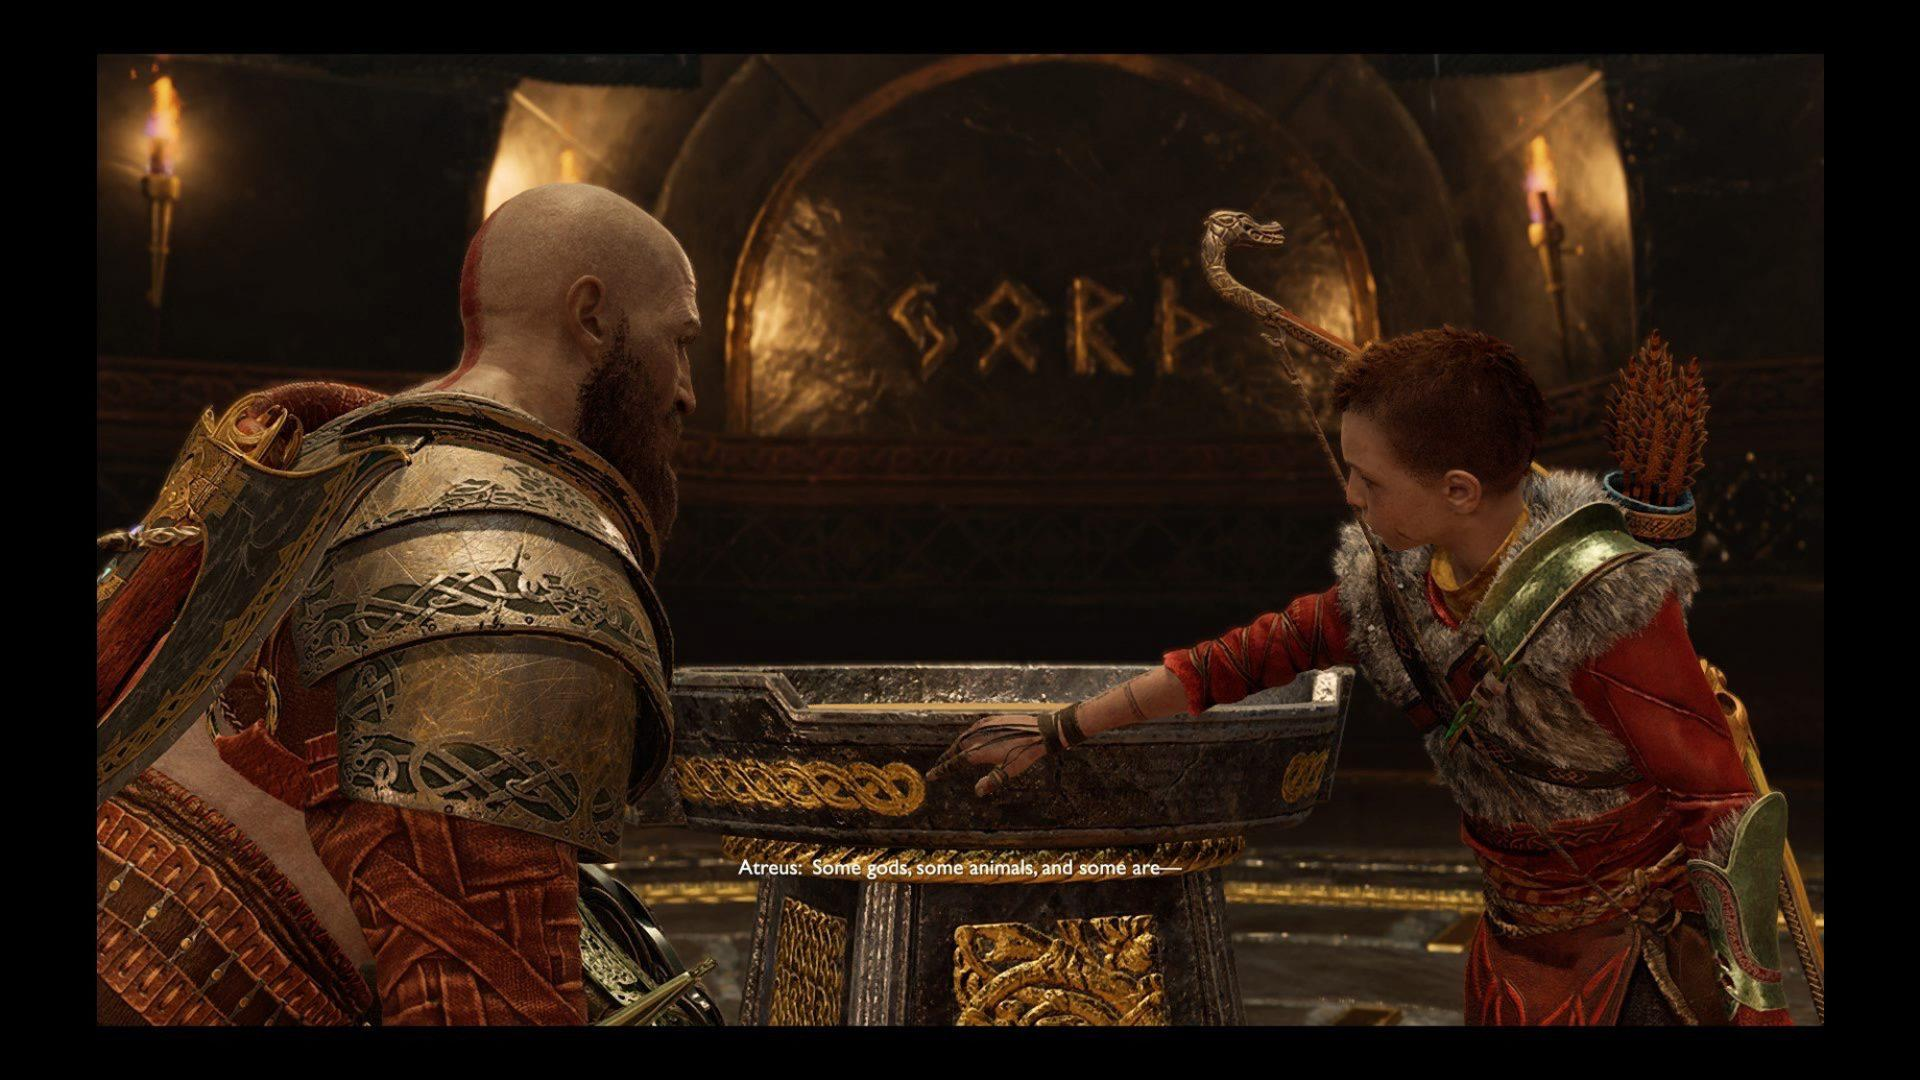 OPINION: God of War, pushing games forward